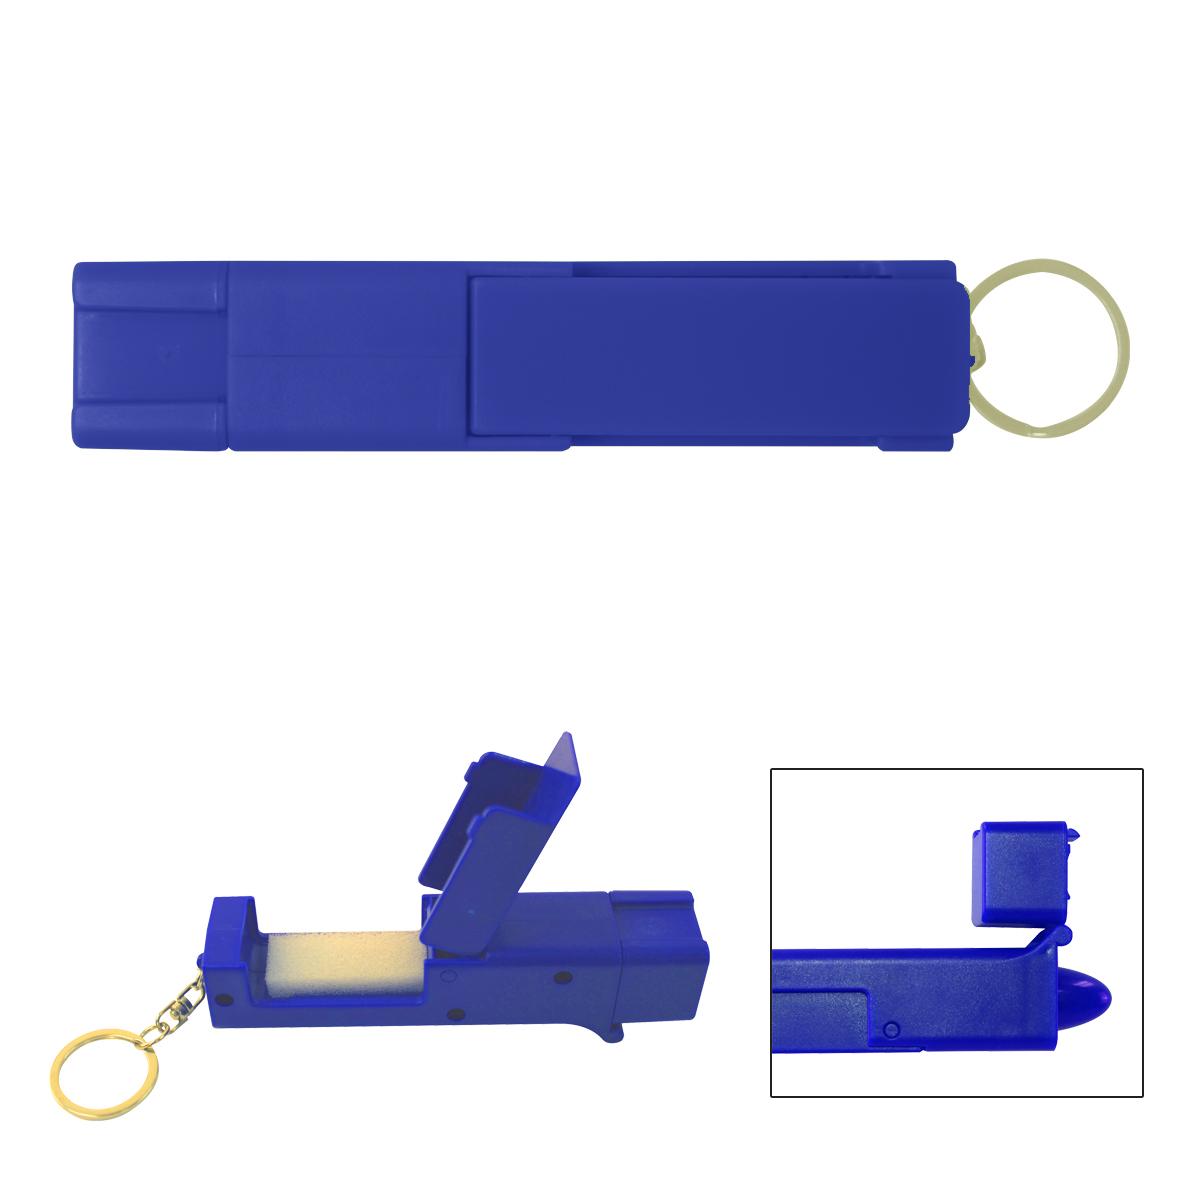 20006 - Herramienta de higiene para abrir puertas